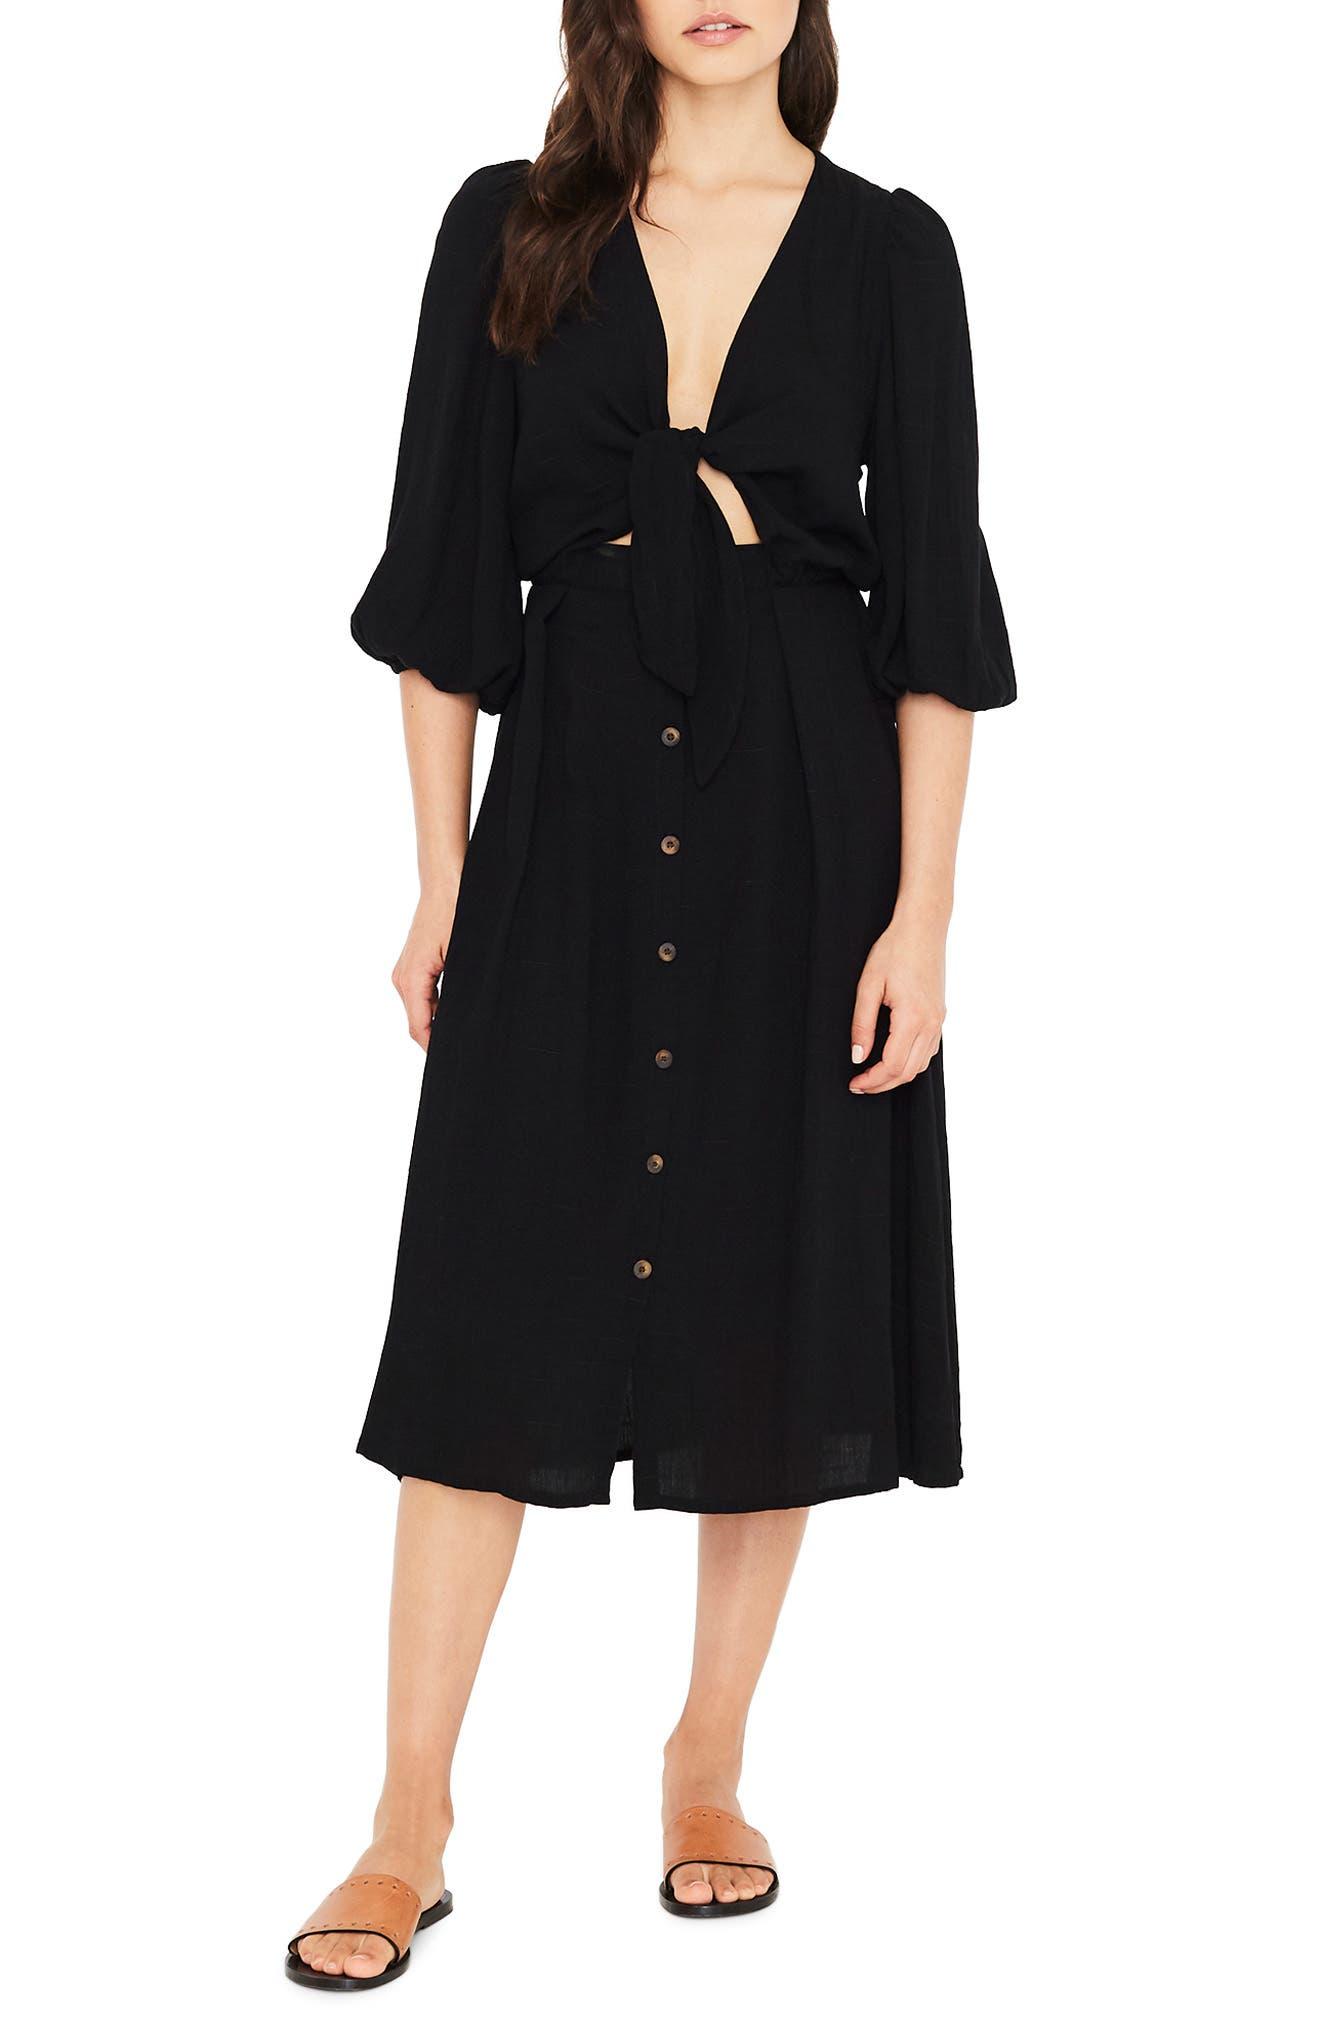 Tobago Tie Front Midi Dress,                             Main thumbnail 1, color,                             PLAIN BLACK